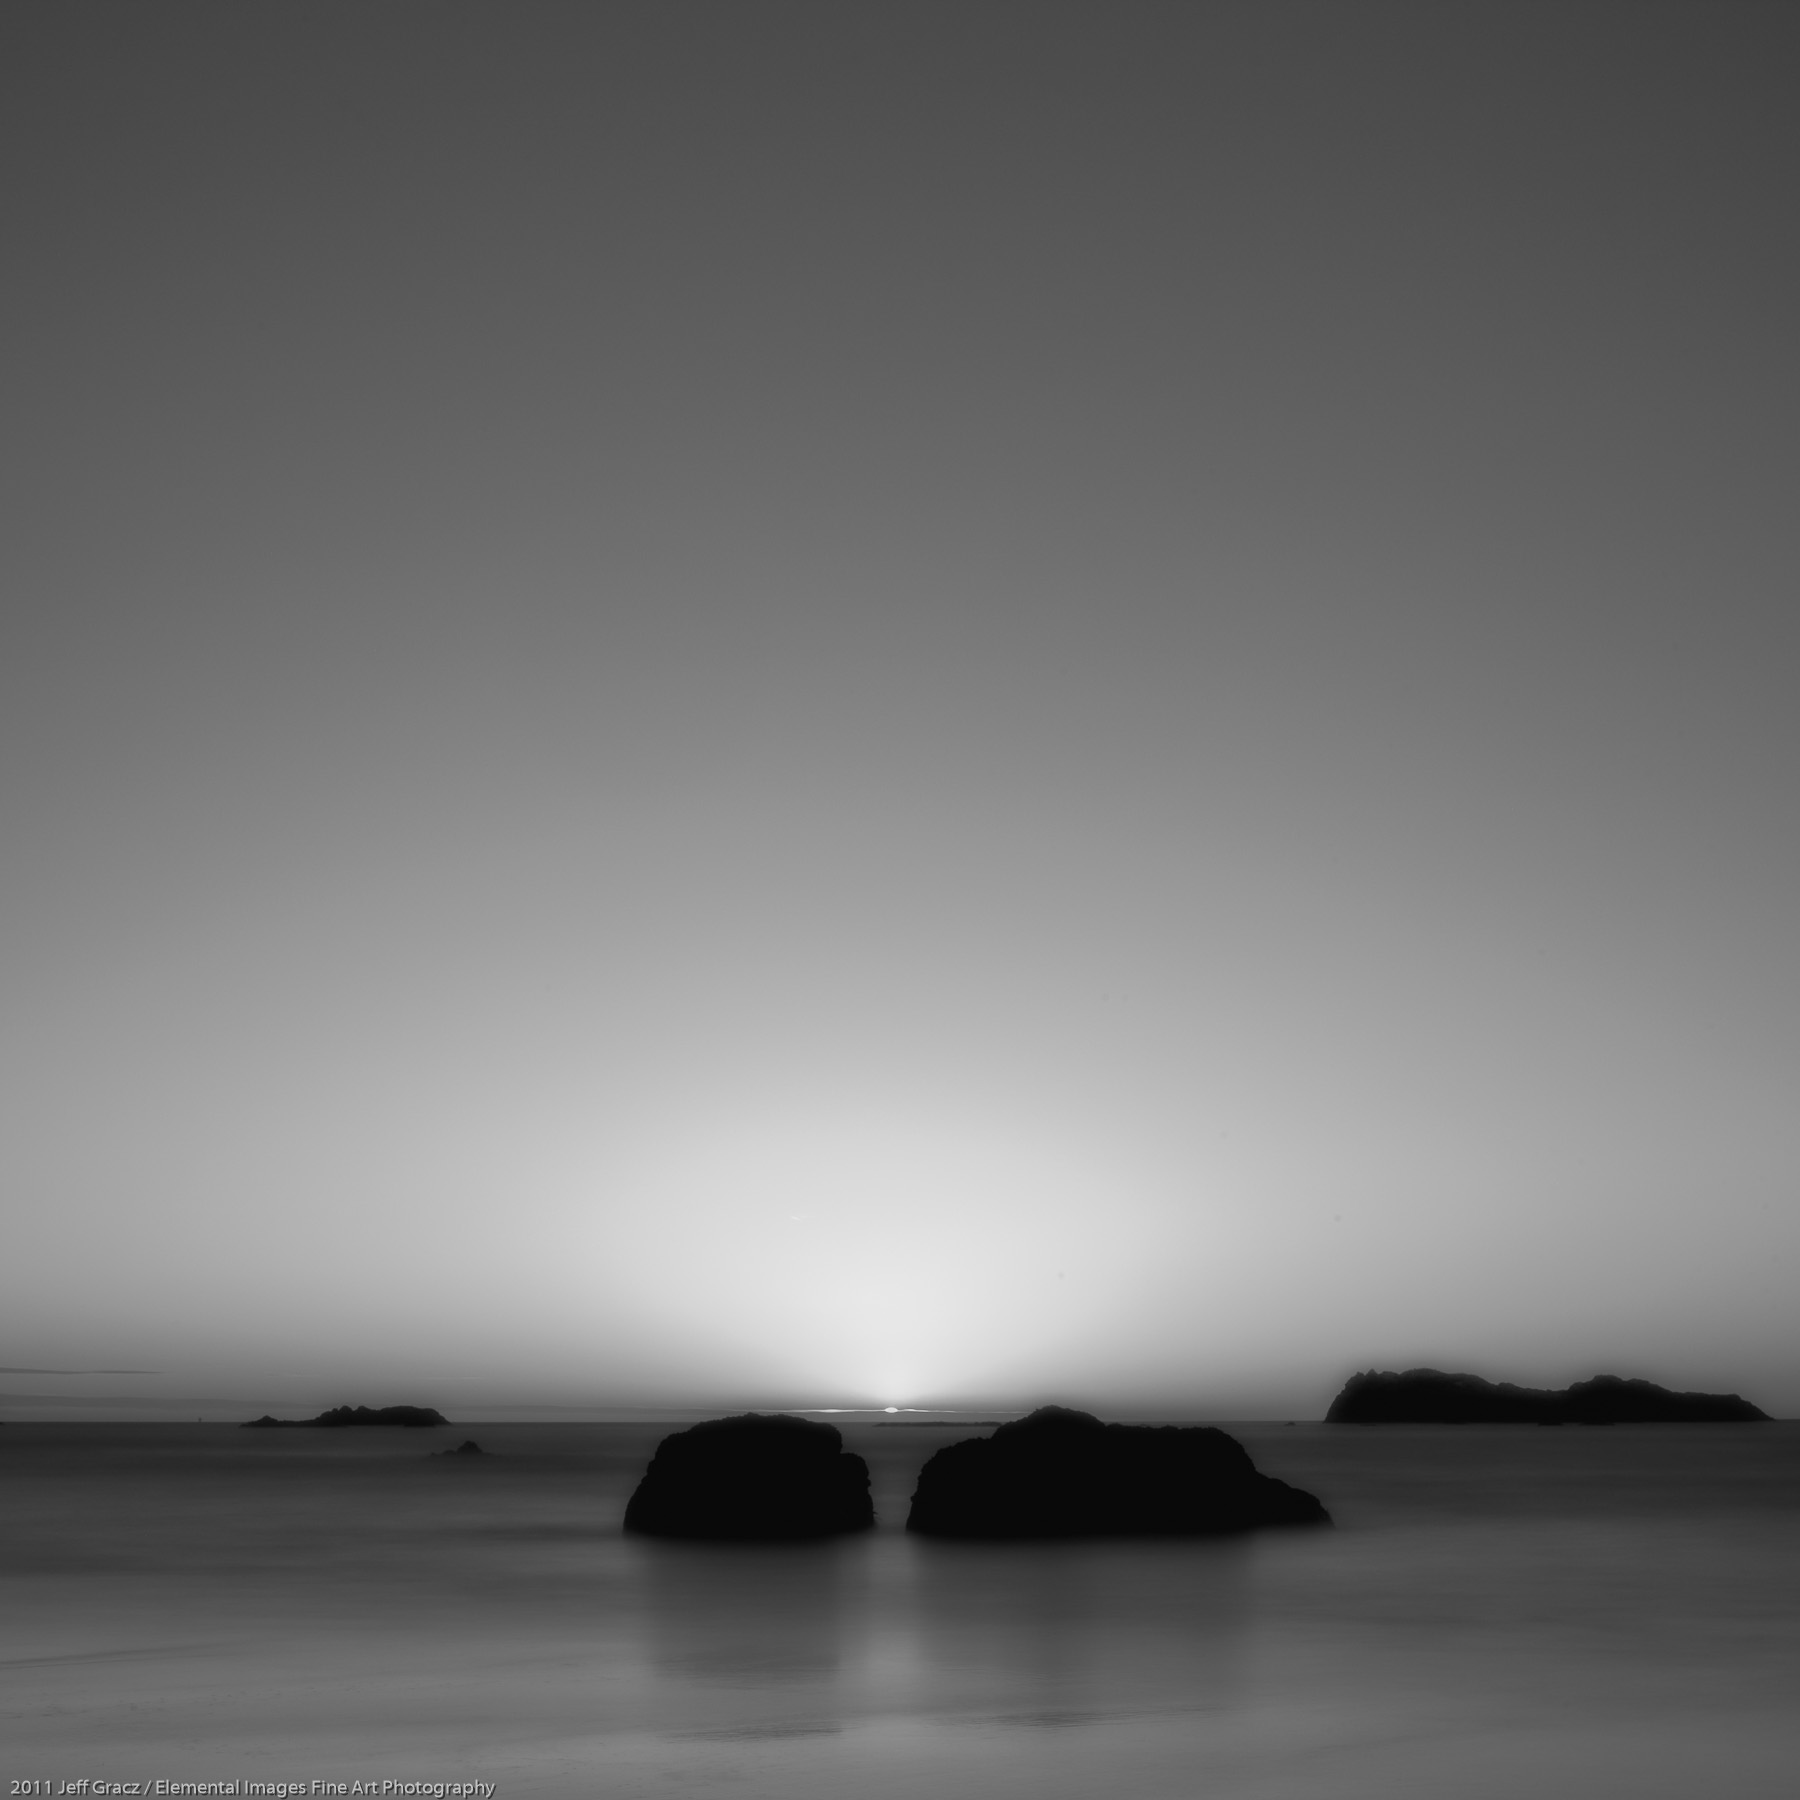 Zen Rocks V | Trinidad | CA | USA - © 2011 Jeff Gracz / Elemental Images Fine Art Photography - All Rights Reserved Worldwide